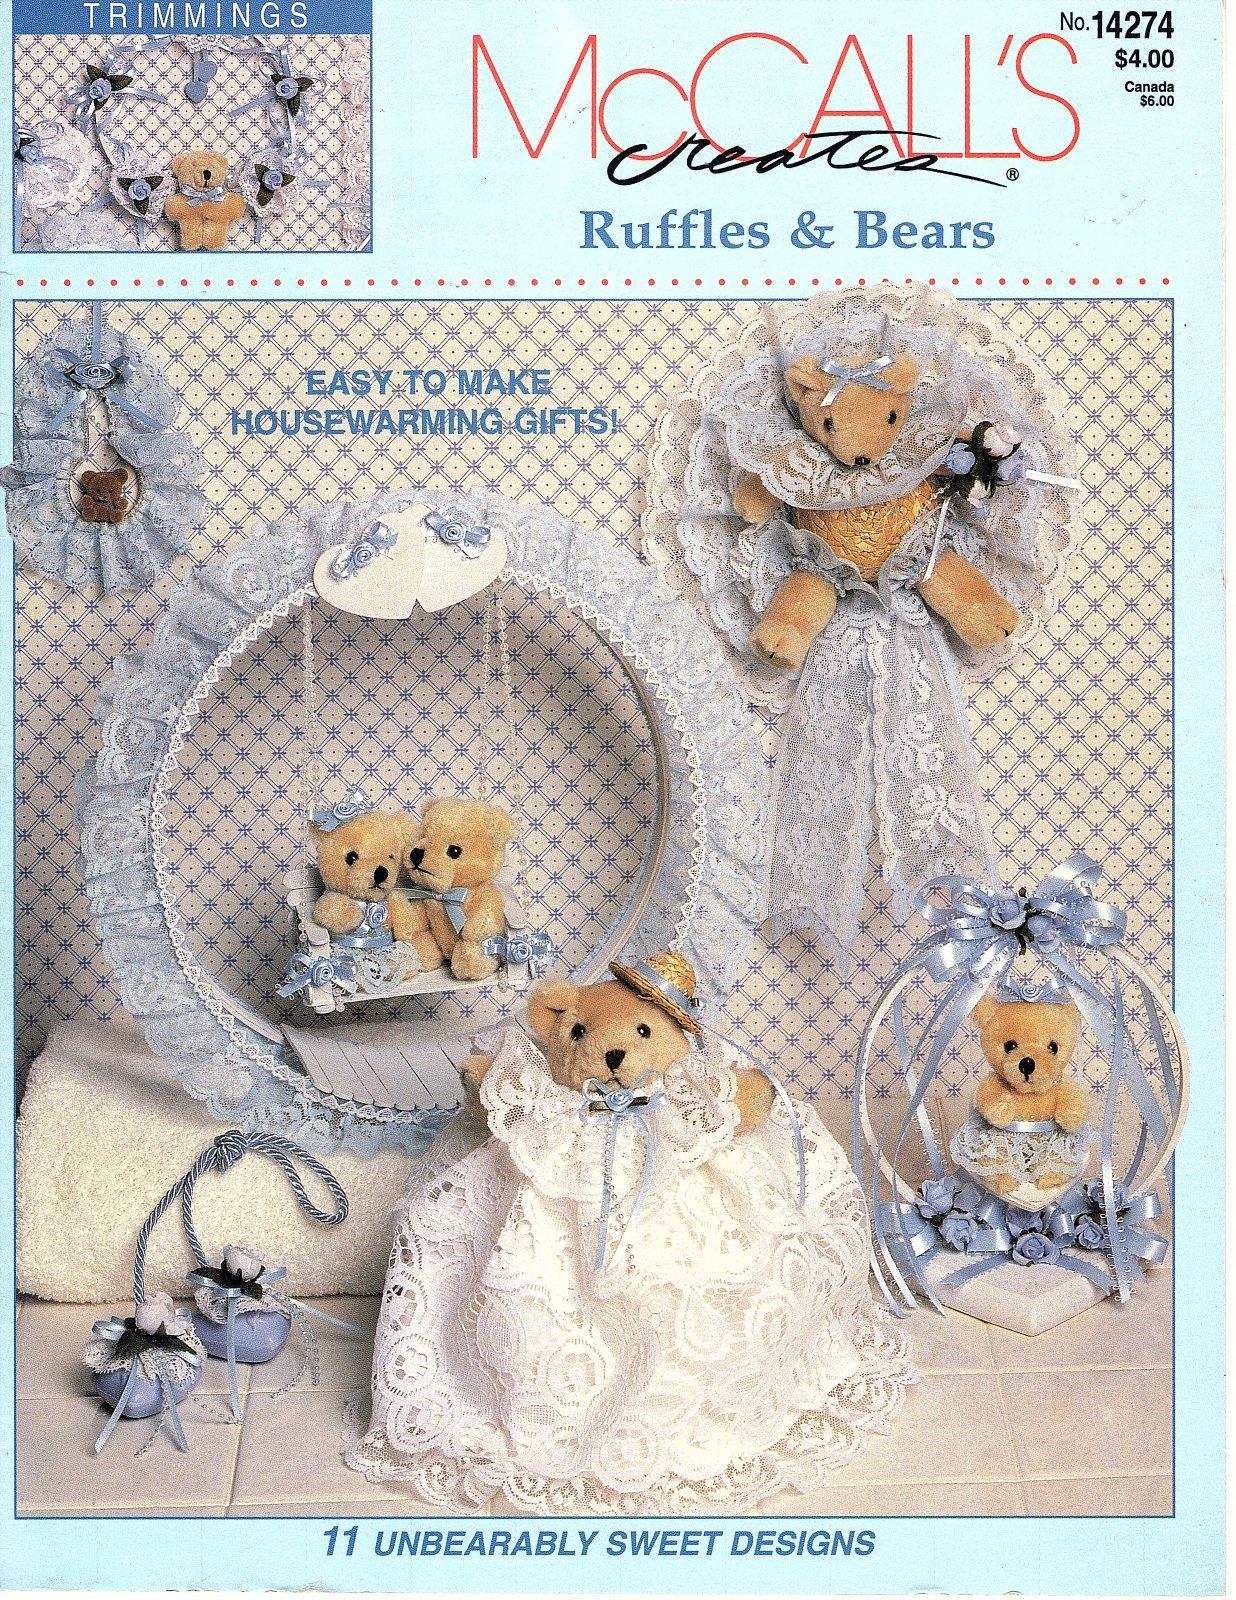 Ruffles & Bears  by McCall's Creates - 11 Unbearably Sweet Designs